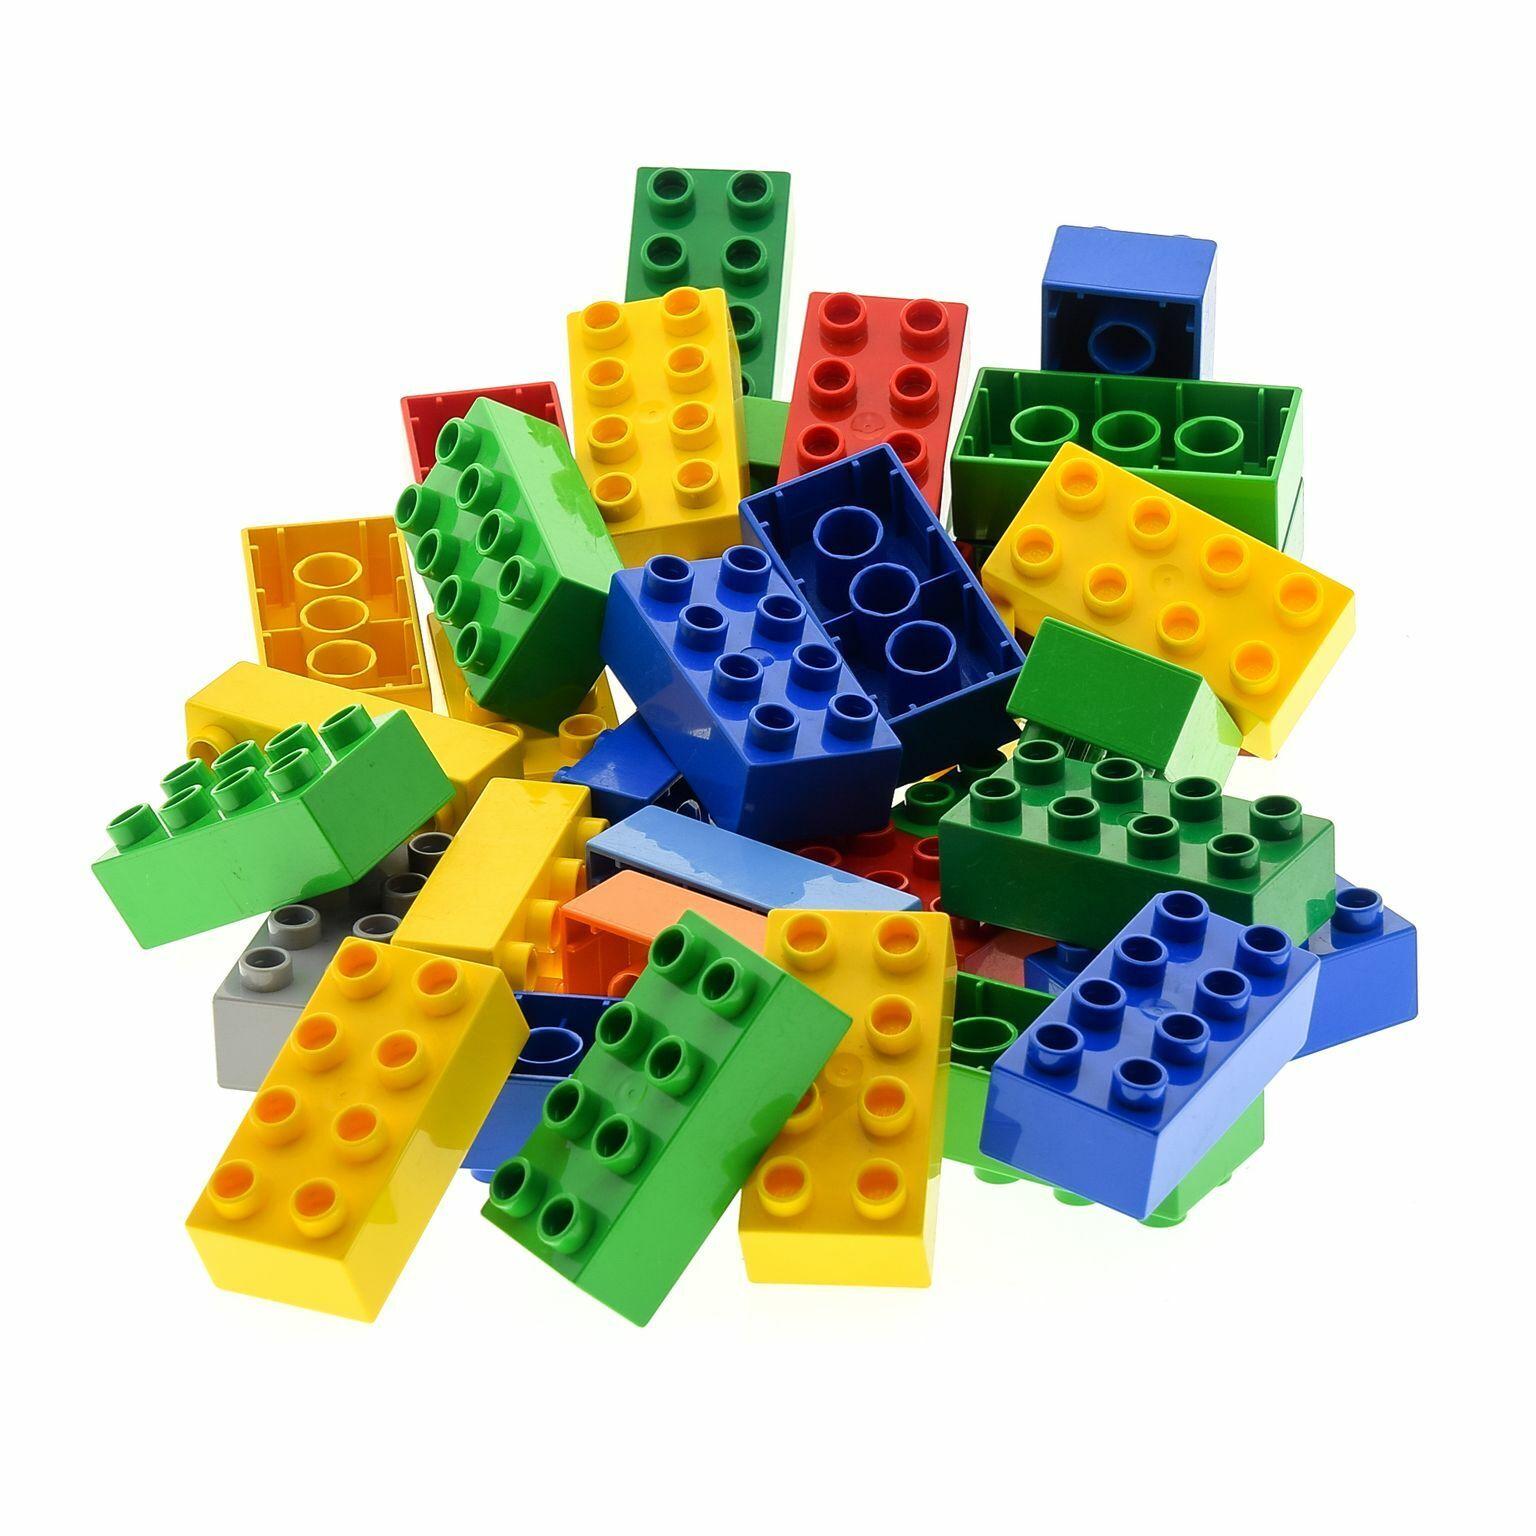 35 x LEGO DUPLO 2x4 Bau Steine Kiloware 3011 31459 Farbe gemischt z.B. red green